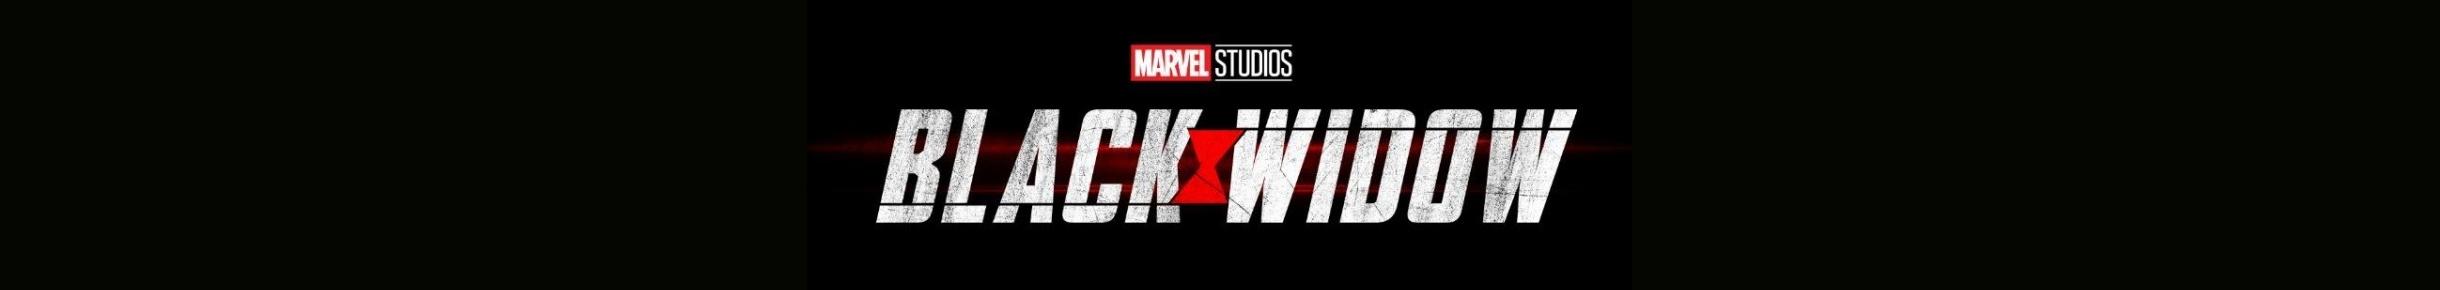 Black Widow Merchandise Banner